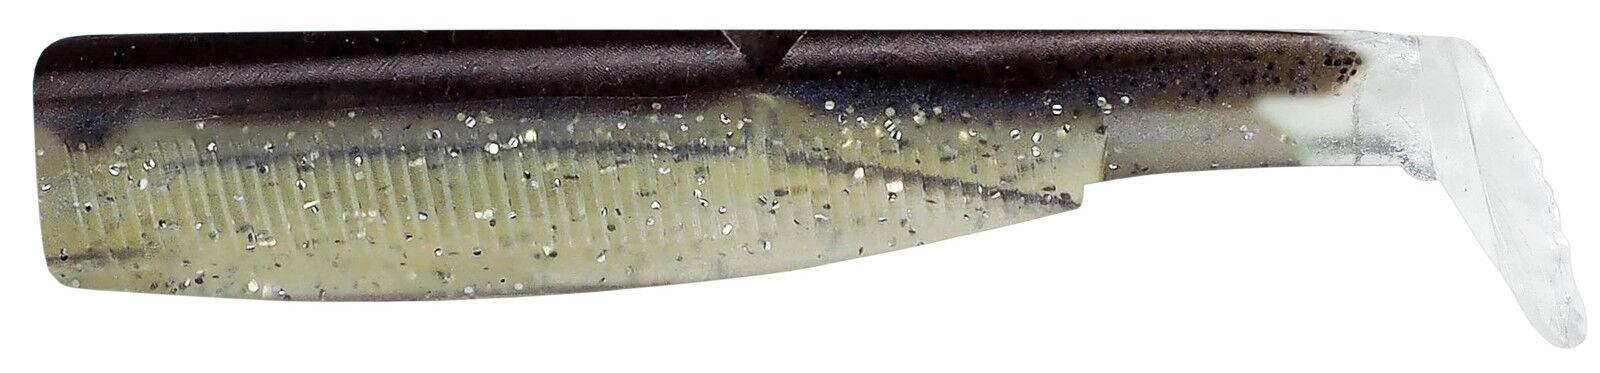 Fiiish Black Minnow taille 1 70 mm bass sandre Sea Sea sandre Fishing Lure Body Pack 5c8cc2